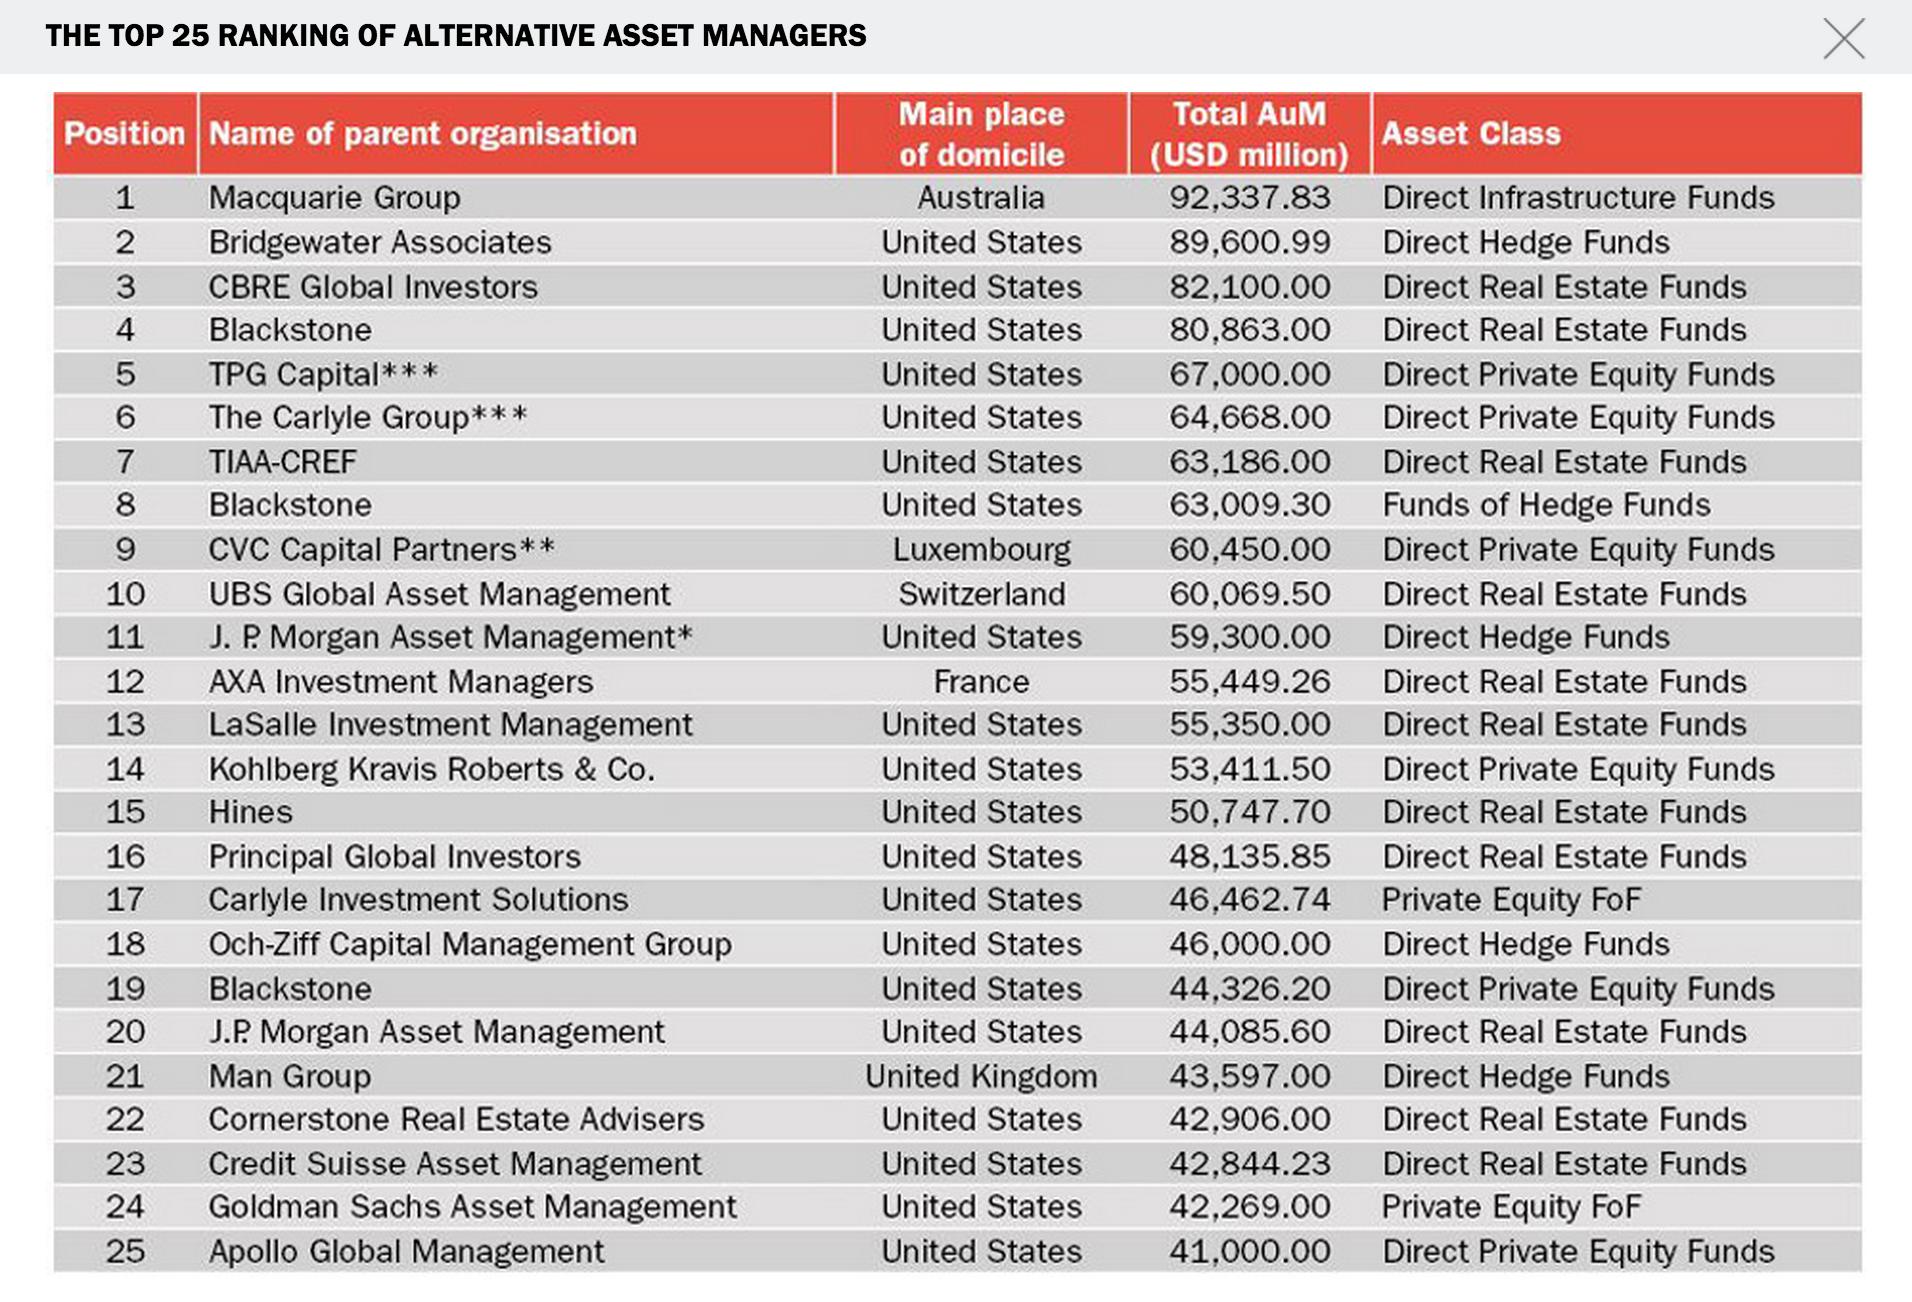 Top 25 Alternative Asset Managers